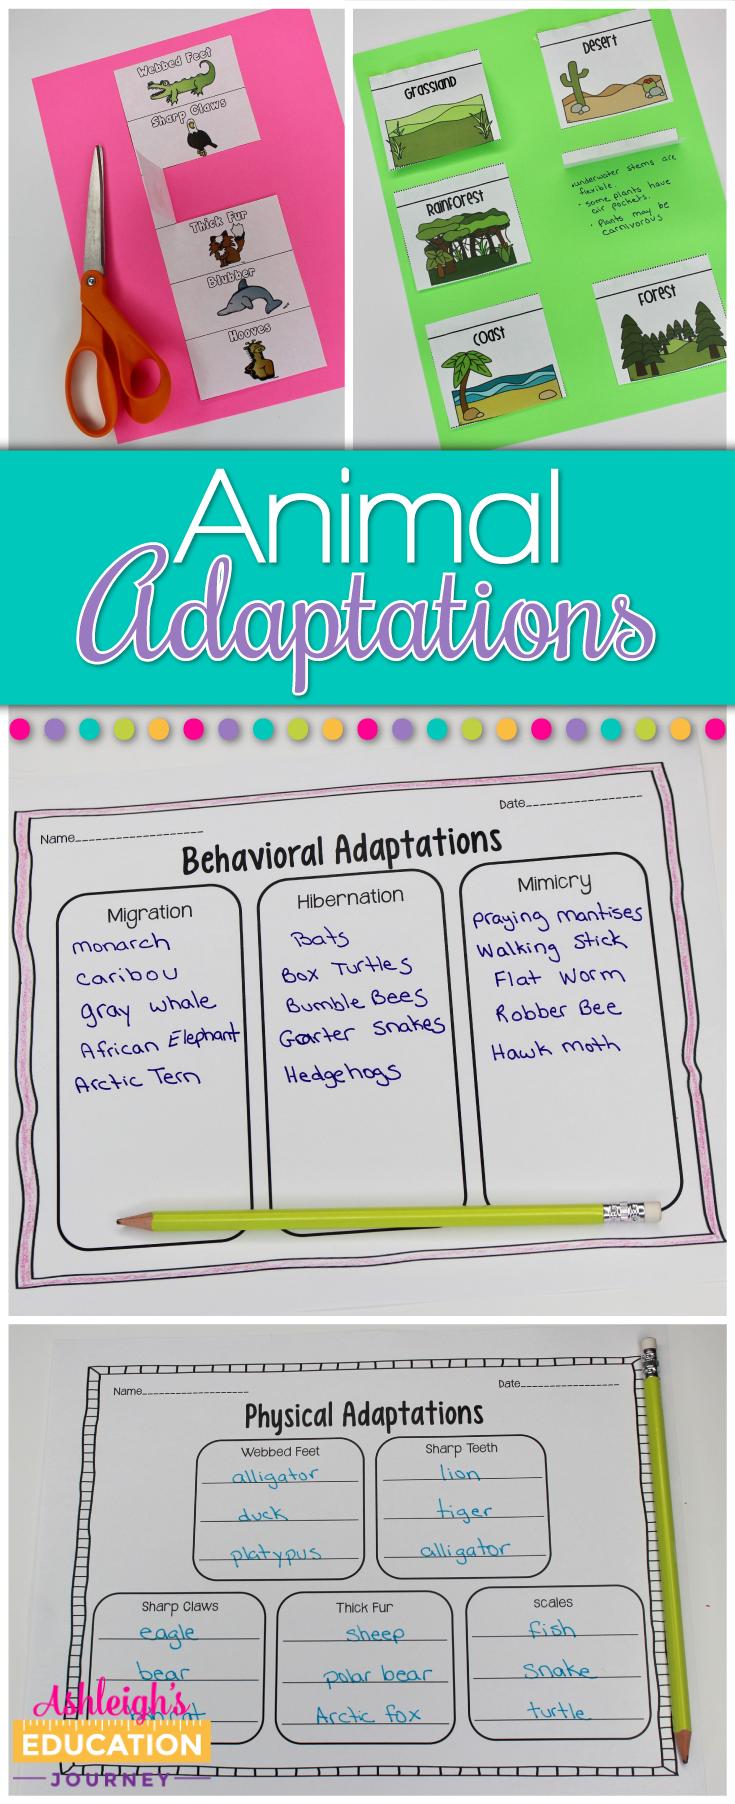 animal adaptations 3rd grade animal adaptations 2nd grade science projects 5th grade science. Black Bedroom Furniture Sets. Home Design Ideas